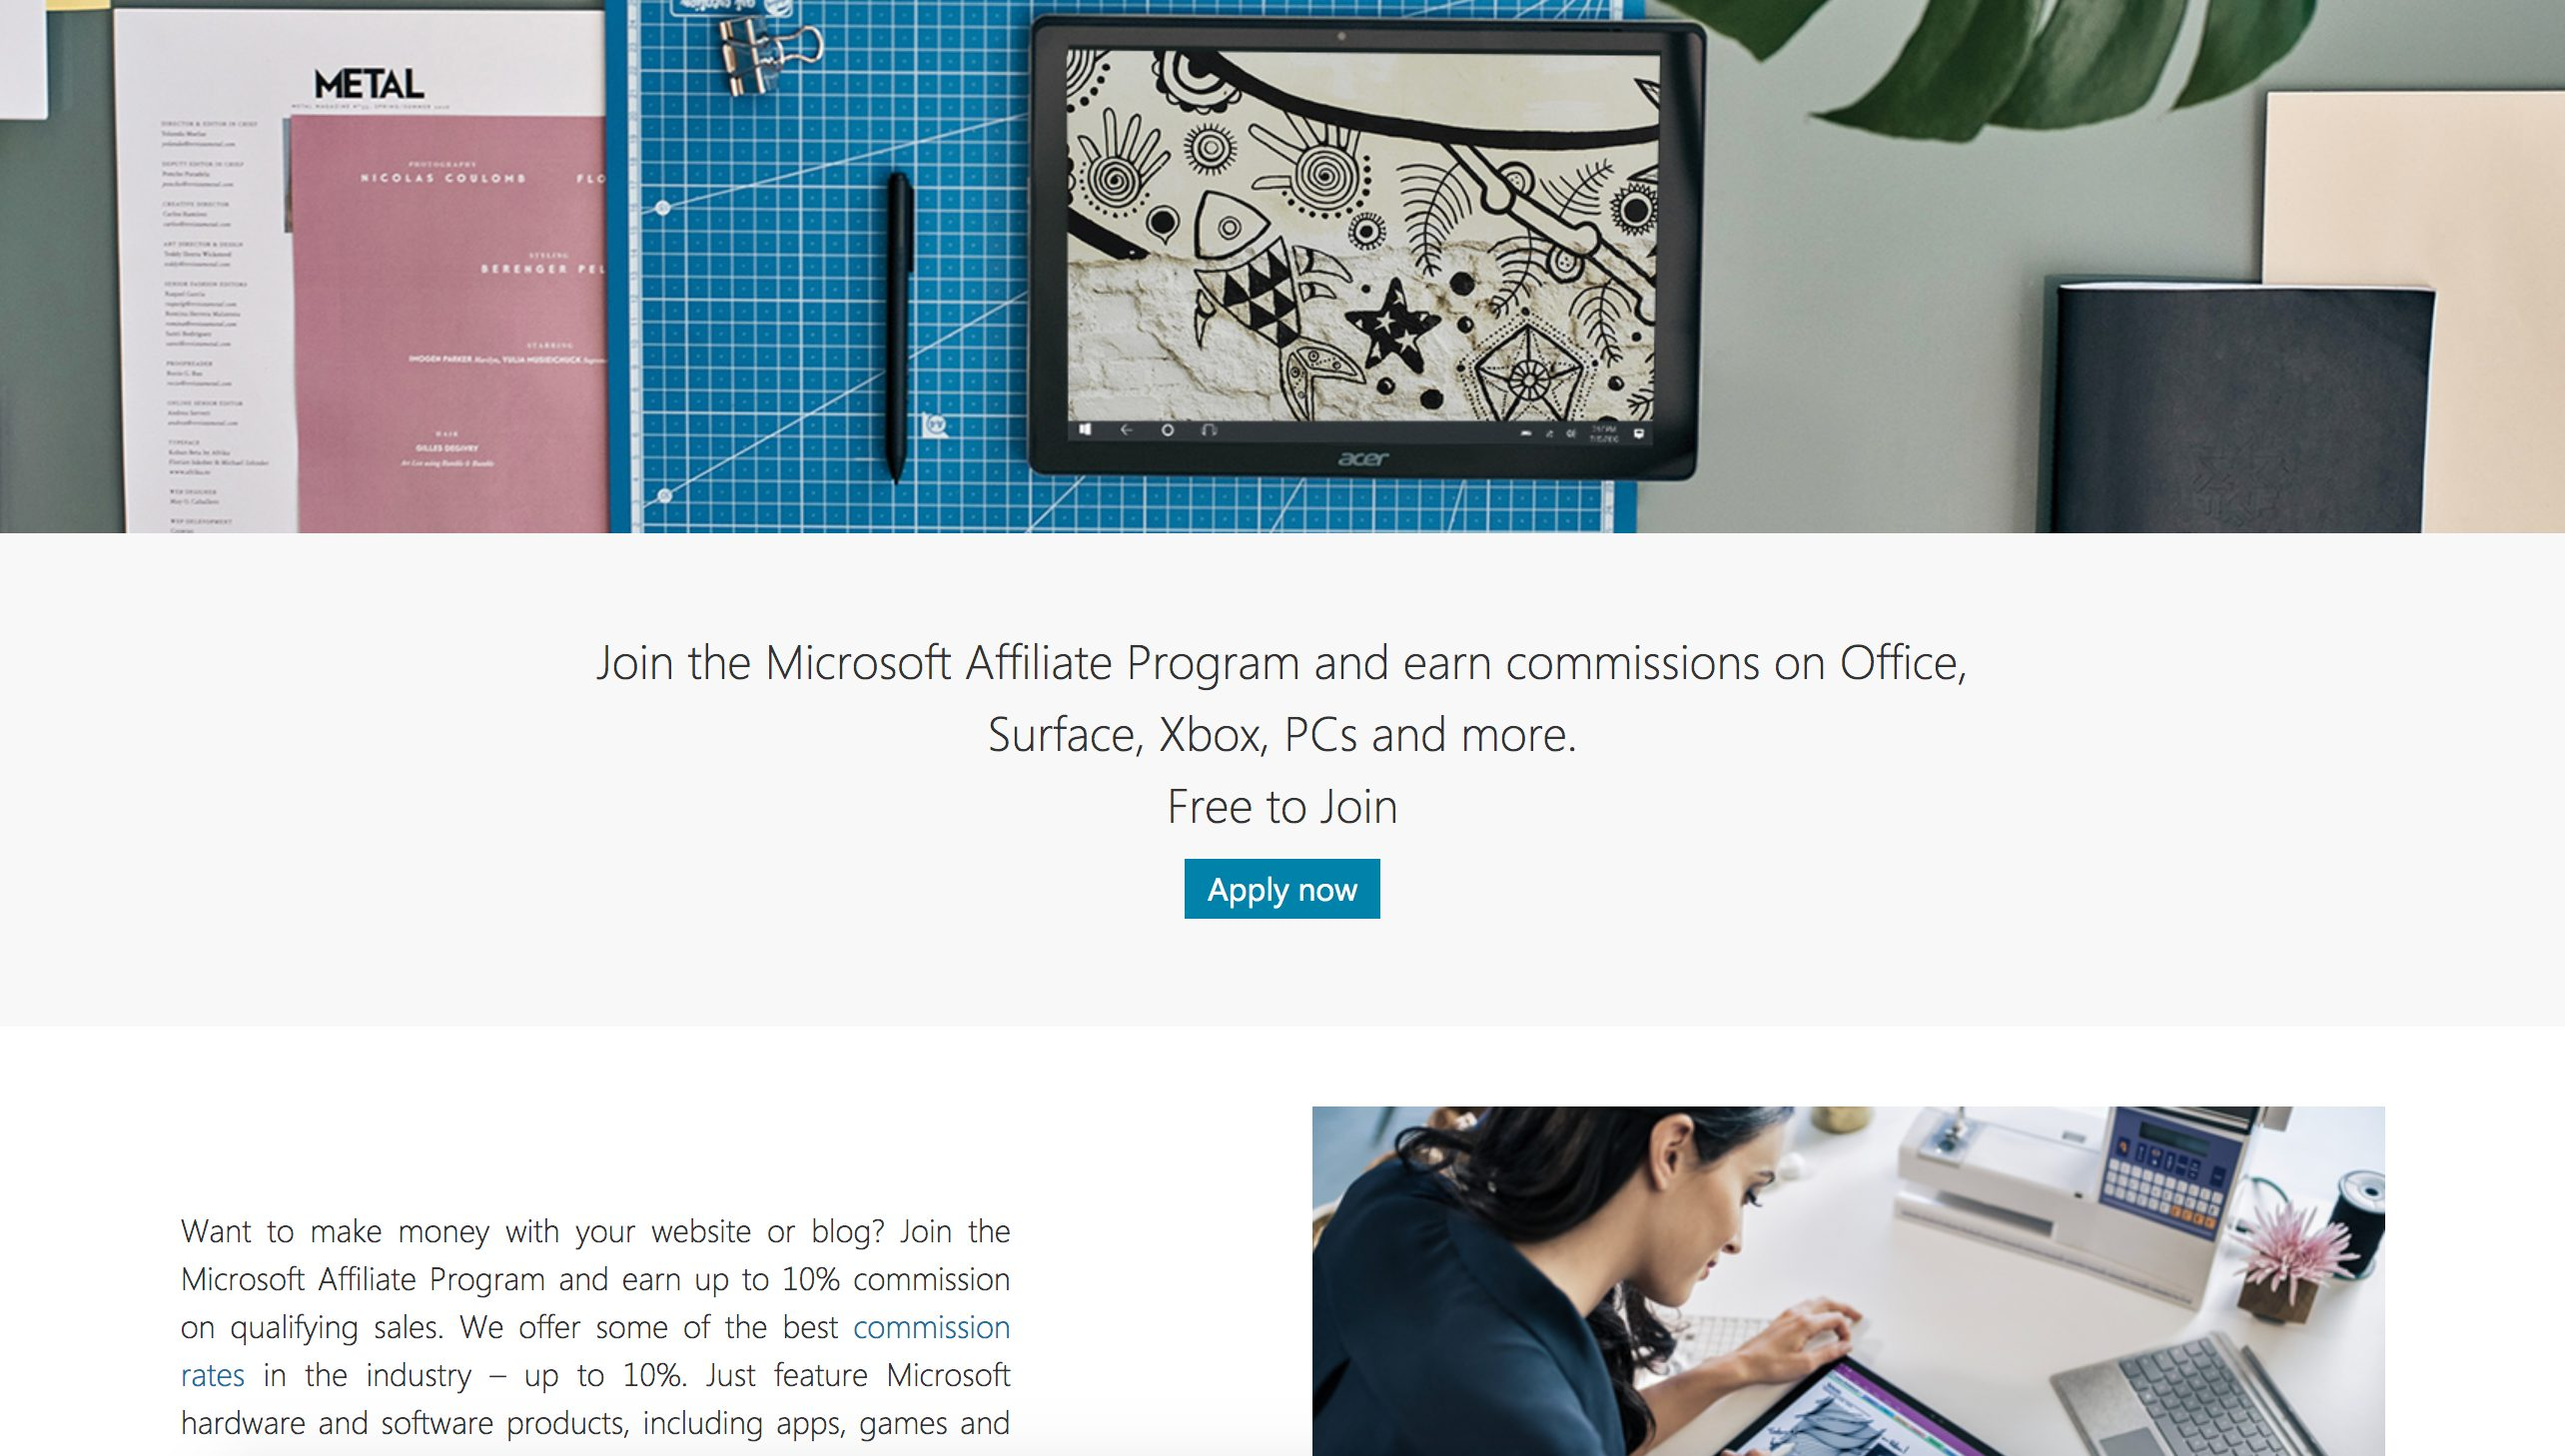 Microsoft Affiliates